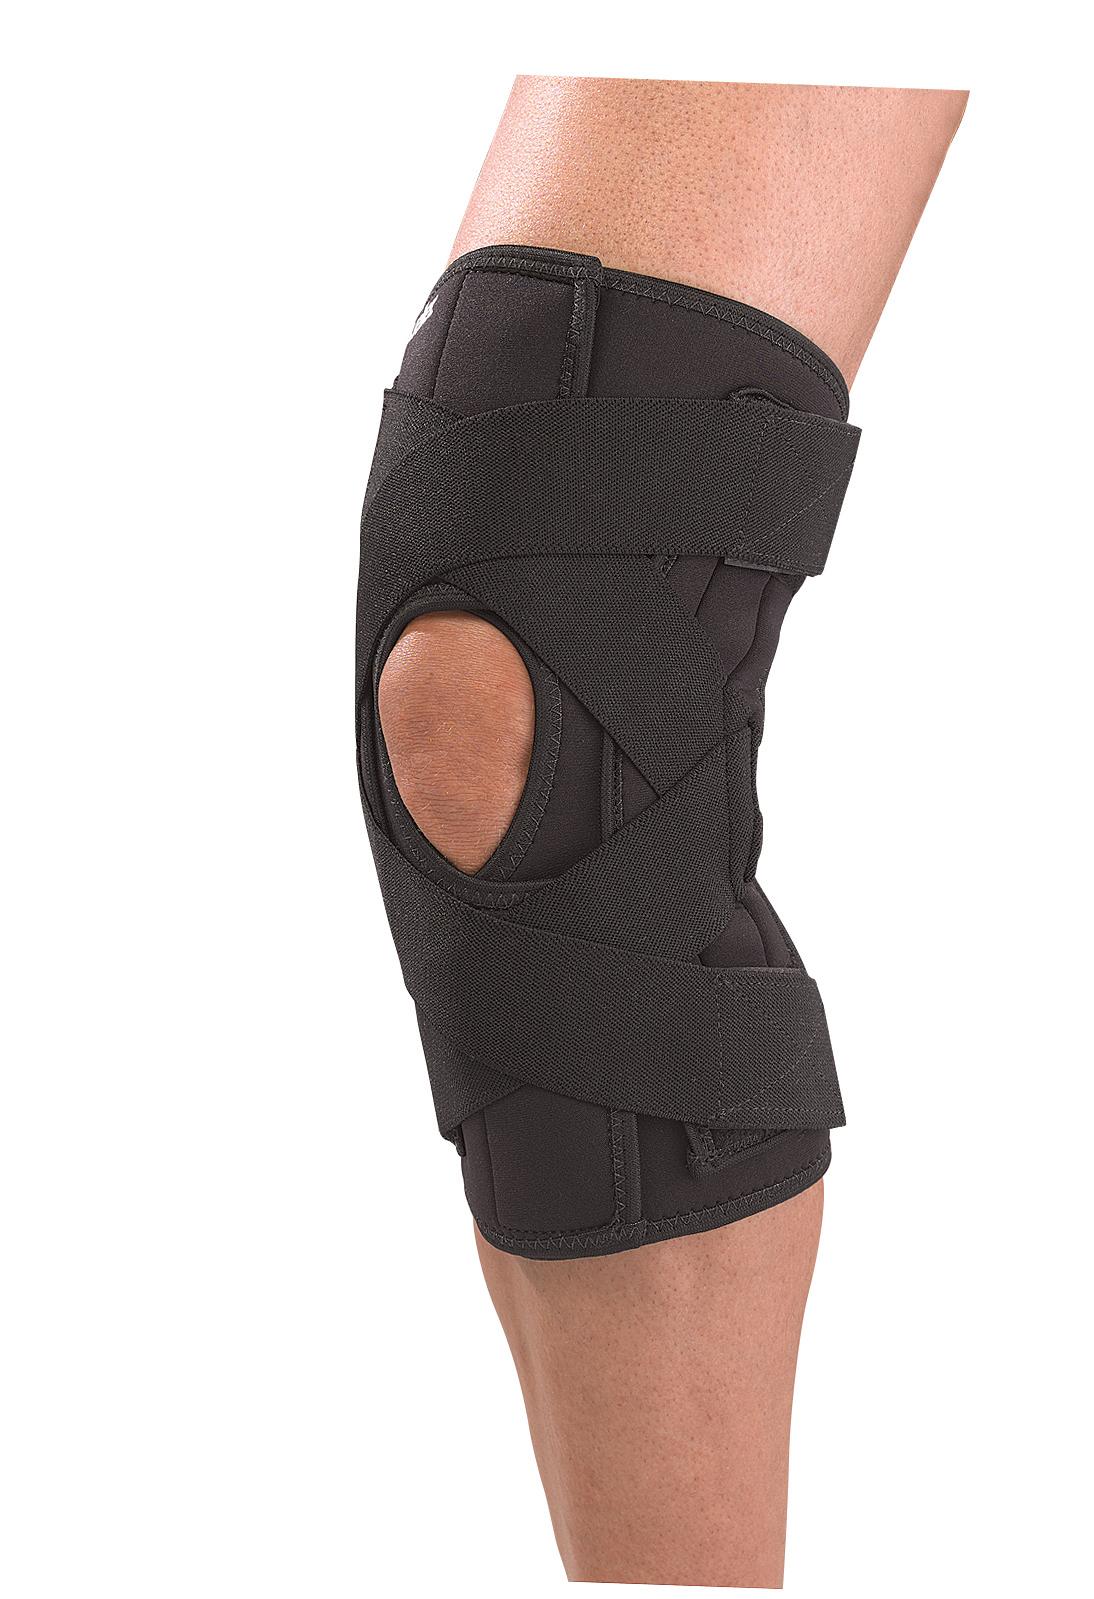 wraparound-knee-brace-deluxe-black-lg-230lg-74676637037-lr.jpg